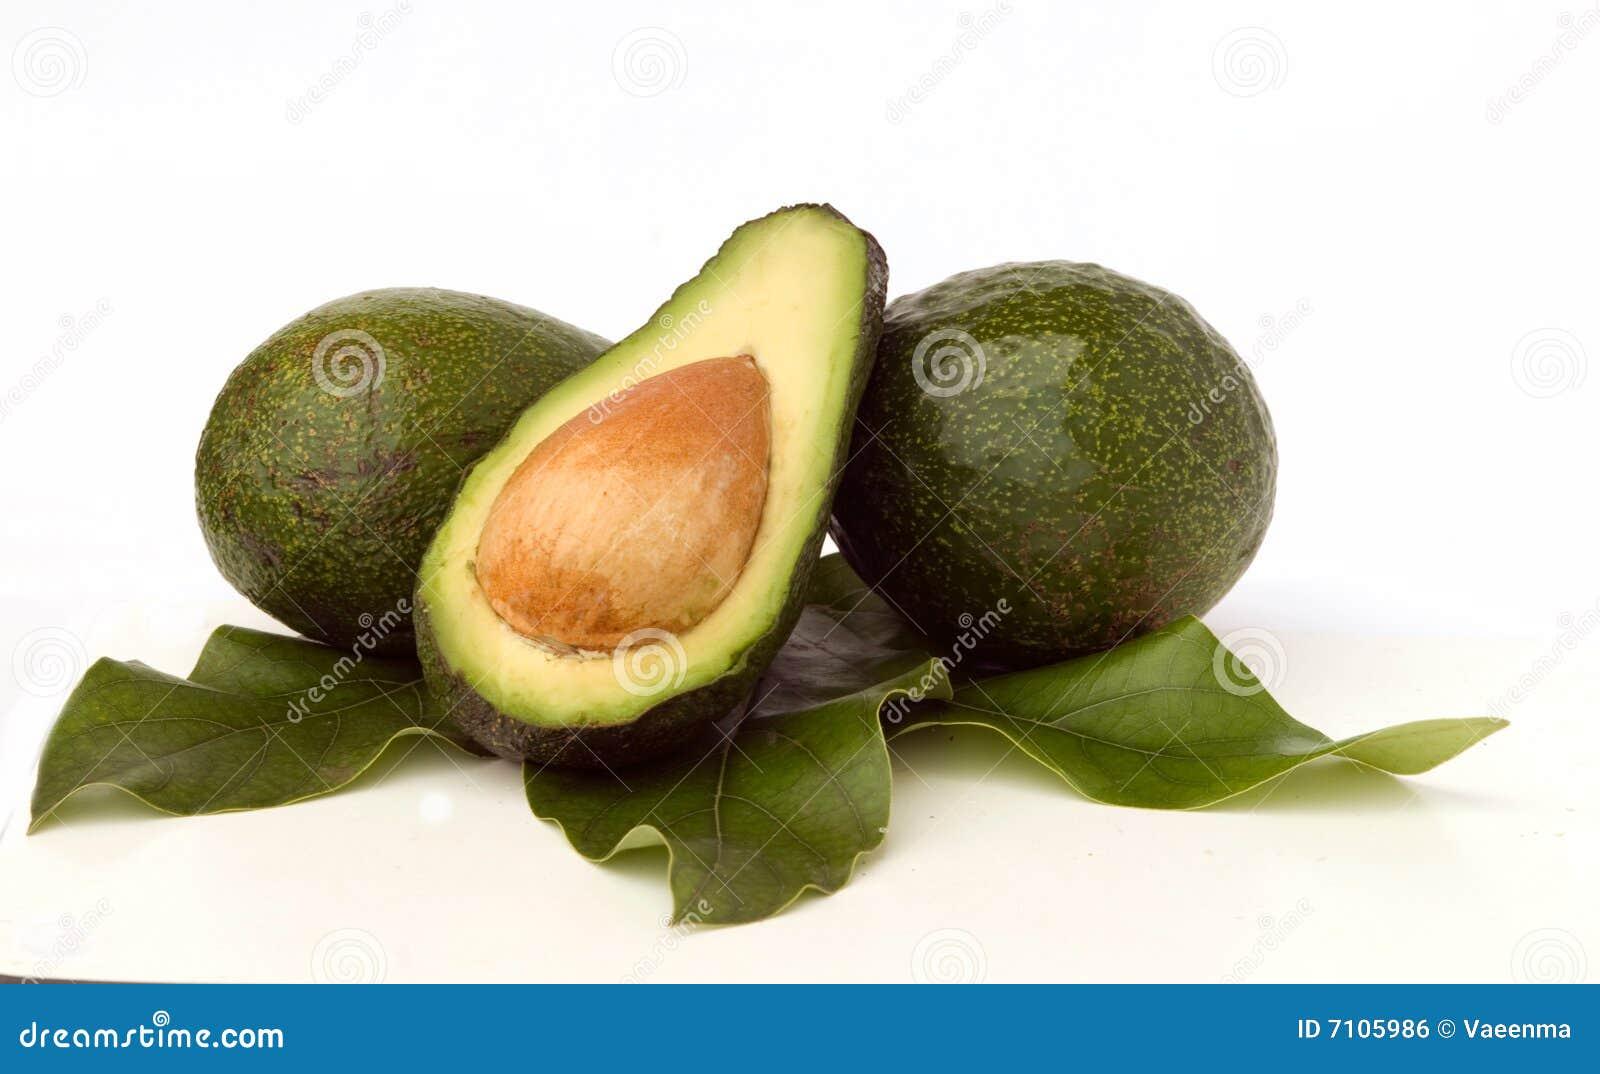 Avokados and avokado section